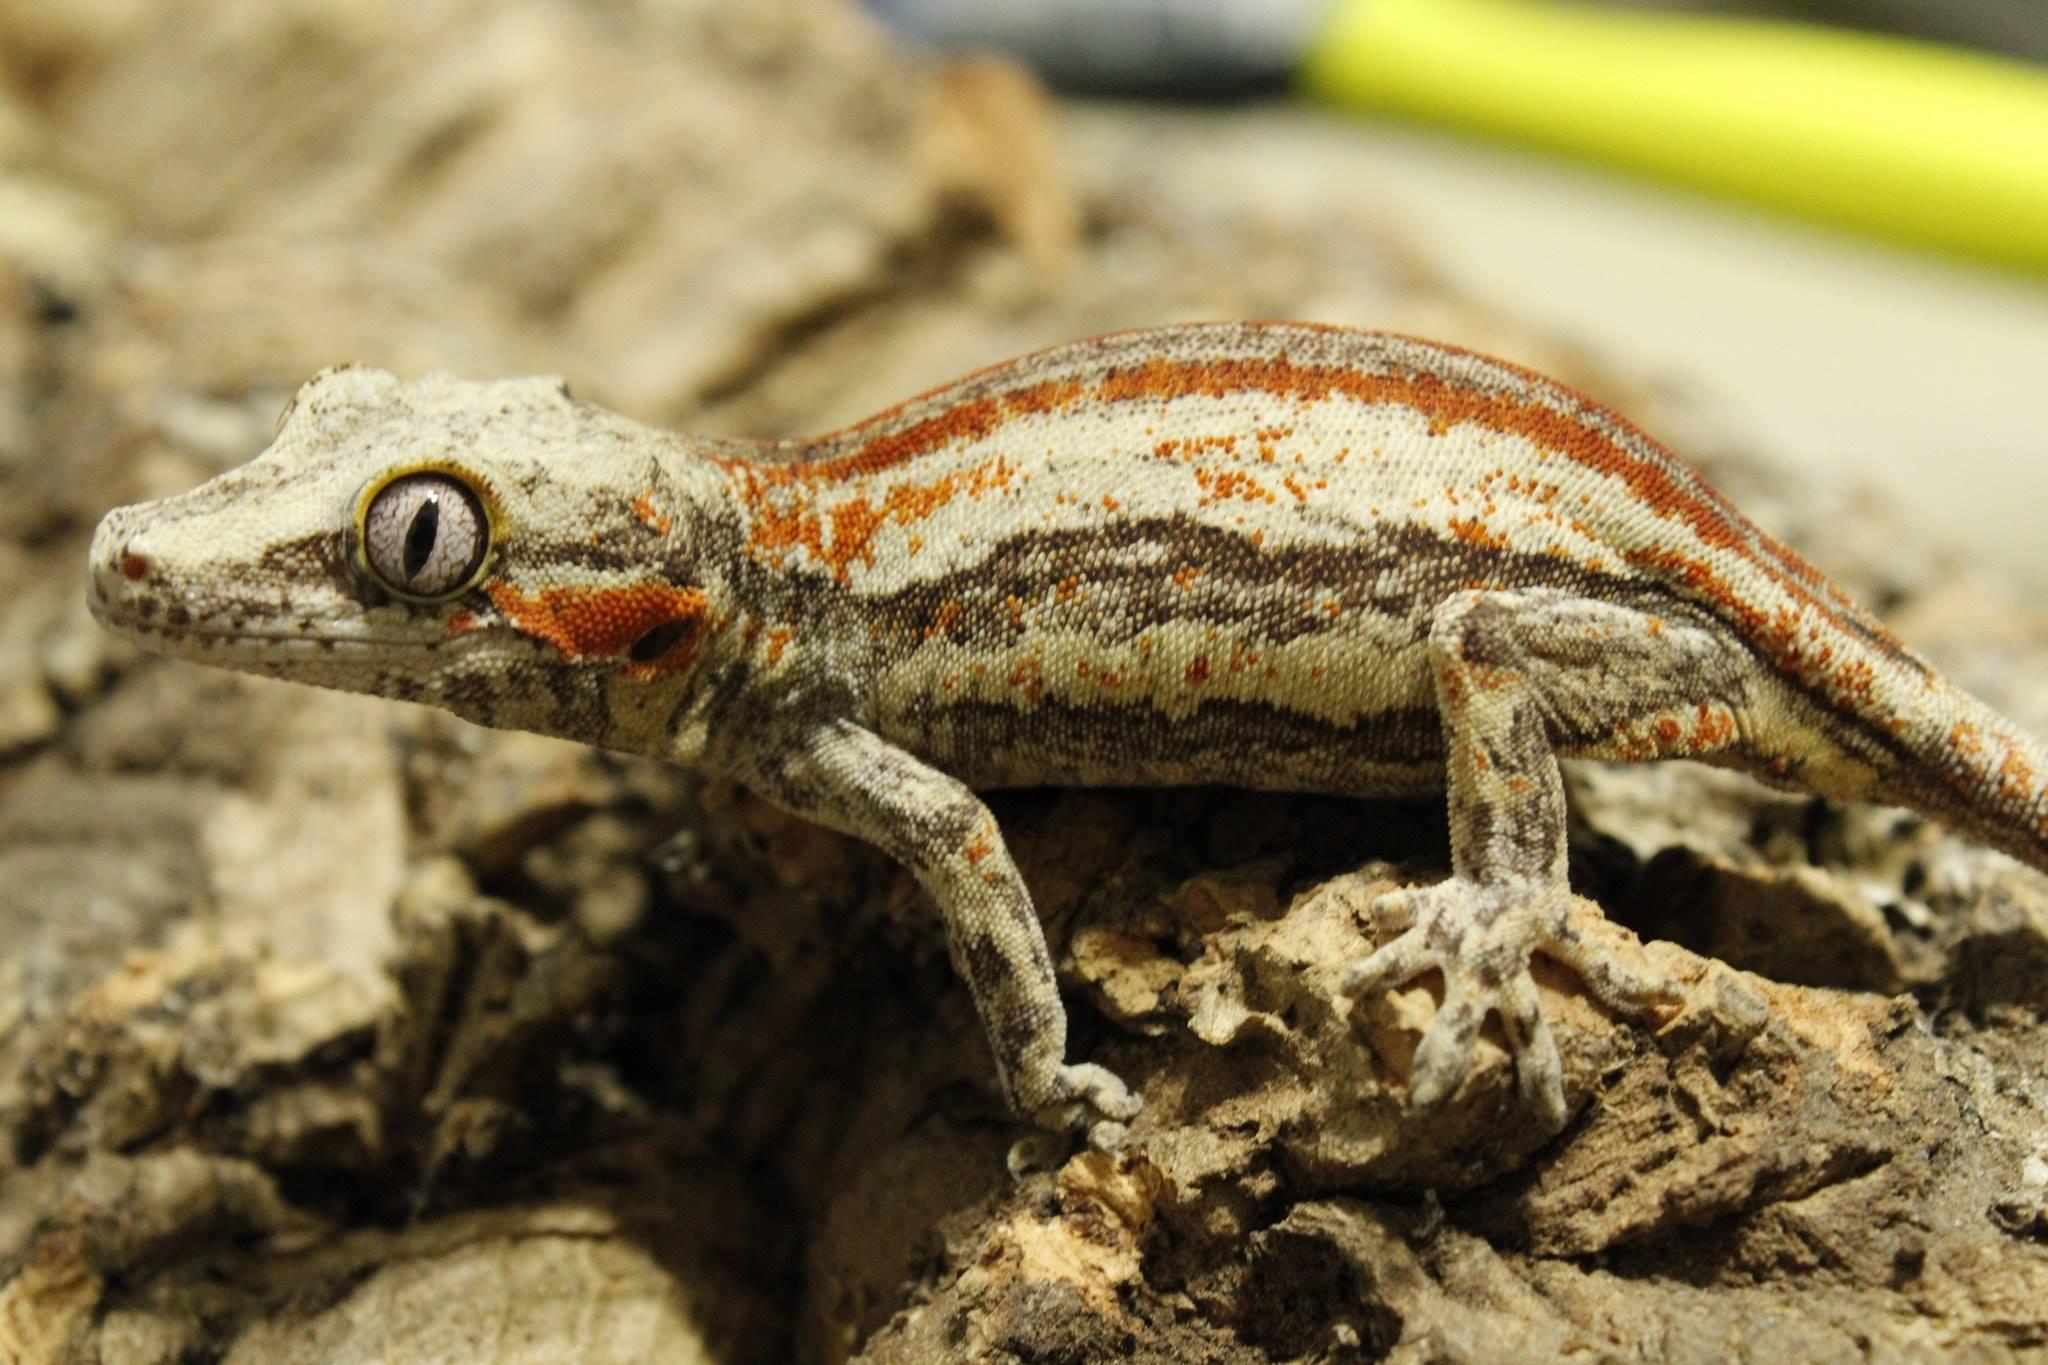 Repashy Crested Gecko Diet MRP Food Reptile Lizard Day Gecko Leachie Gargoyle